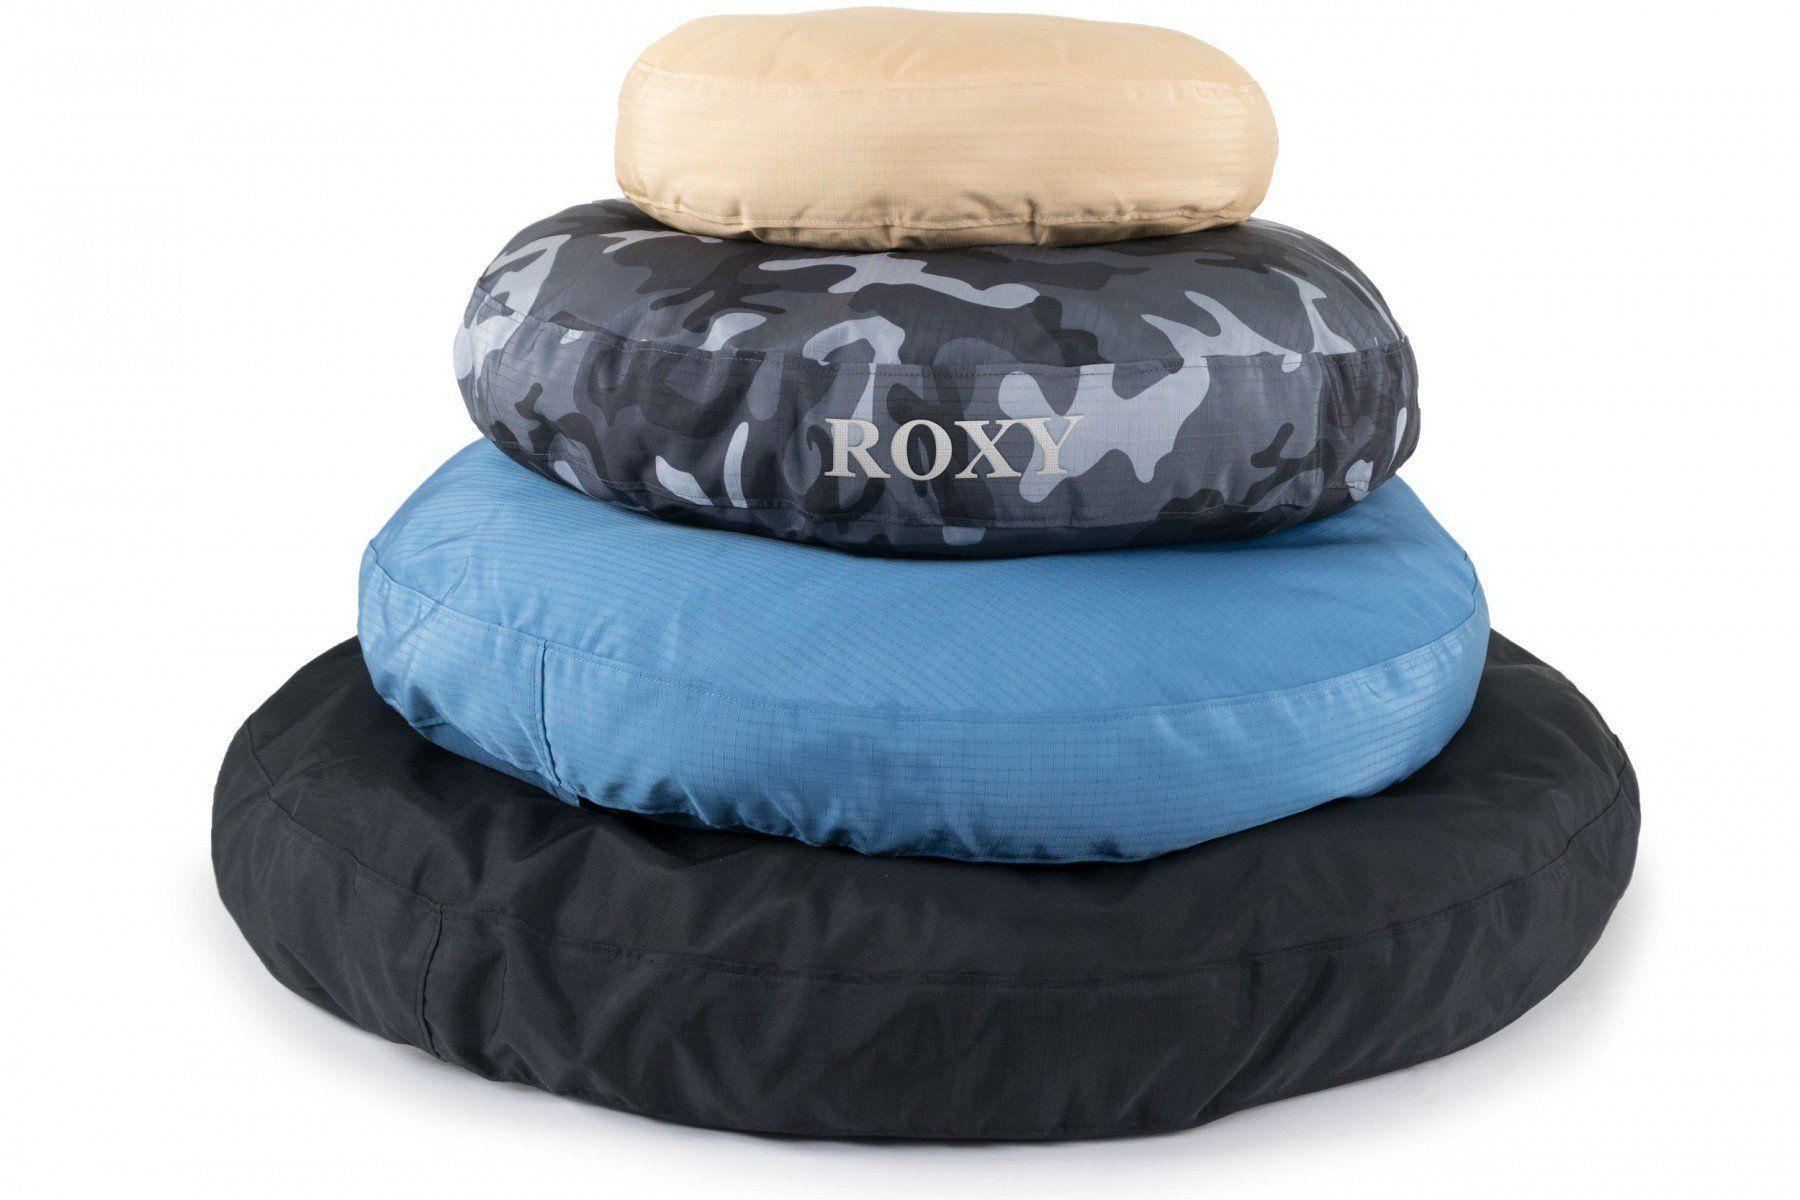 Round Nesting Chew Resistant Dog Bed K9 Ballistics Dog Bed Round Dog Bed Nest Dog Bed